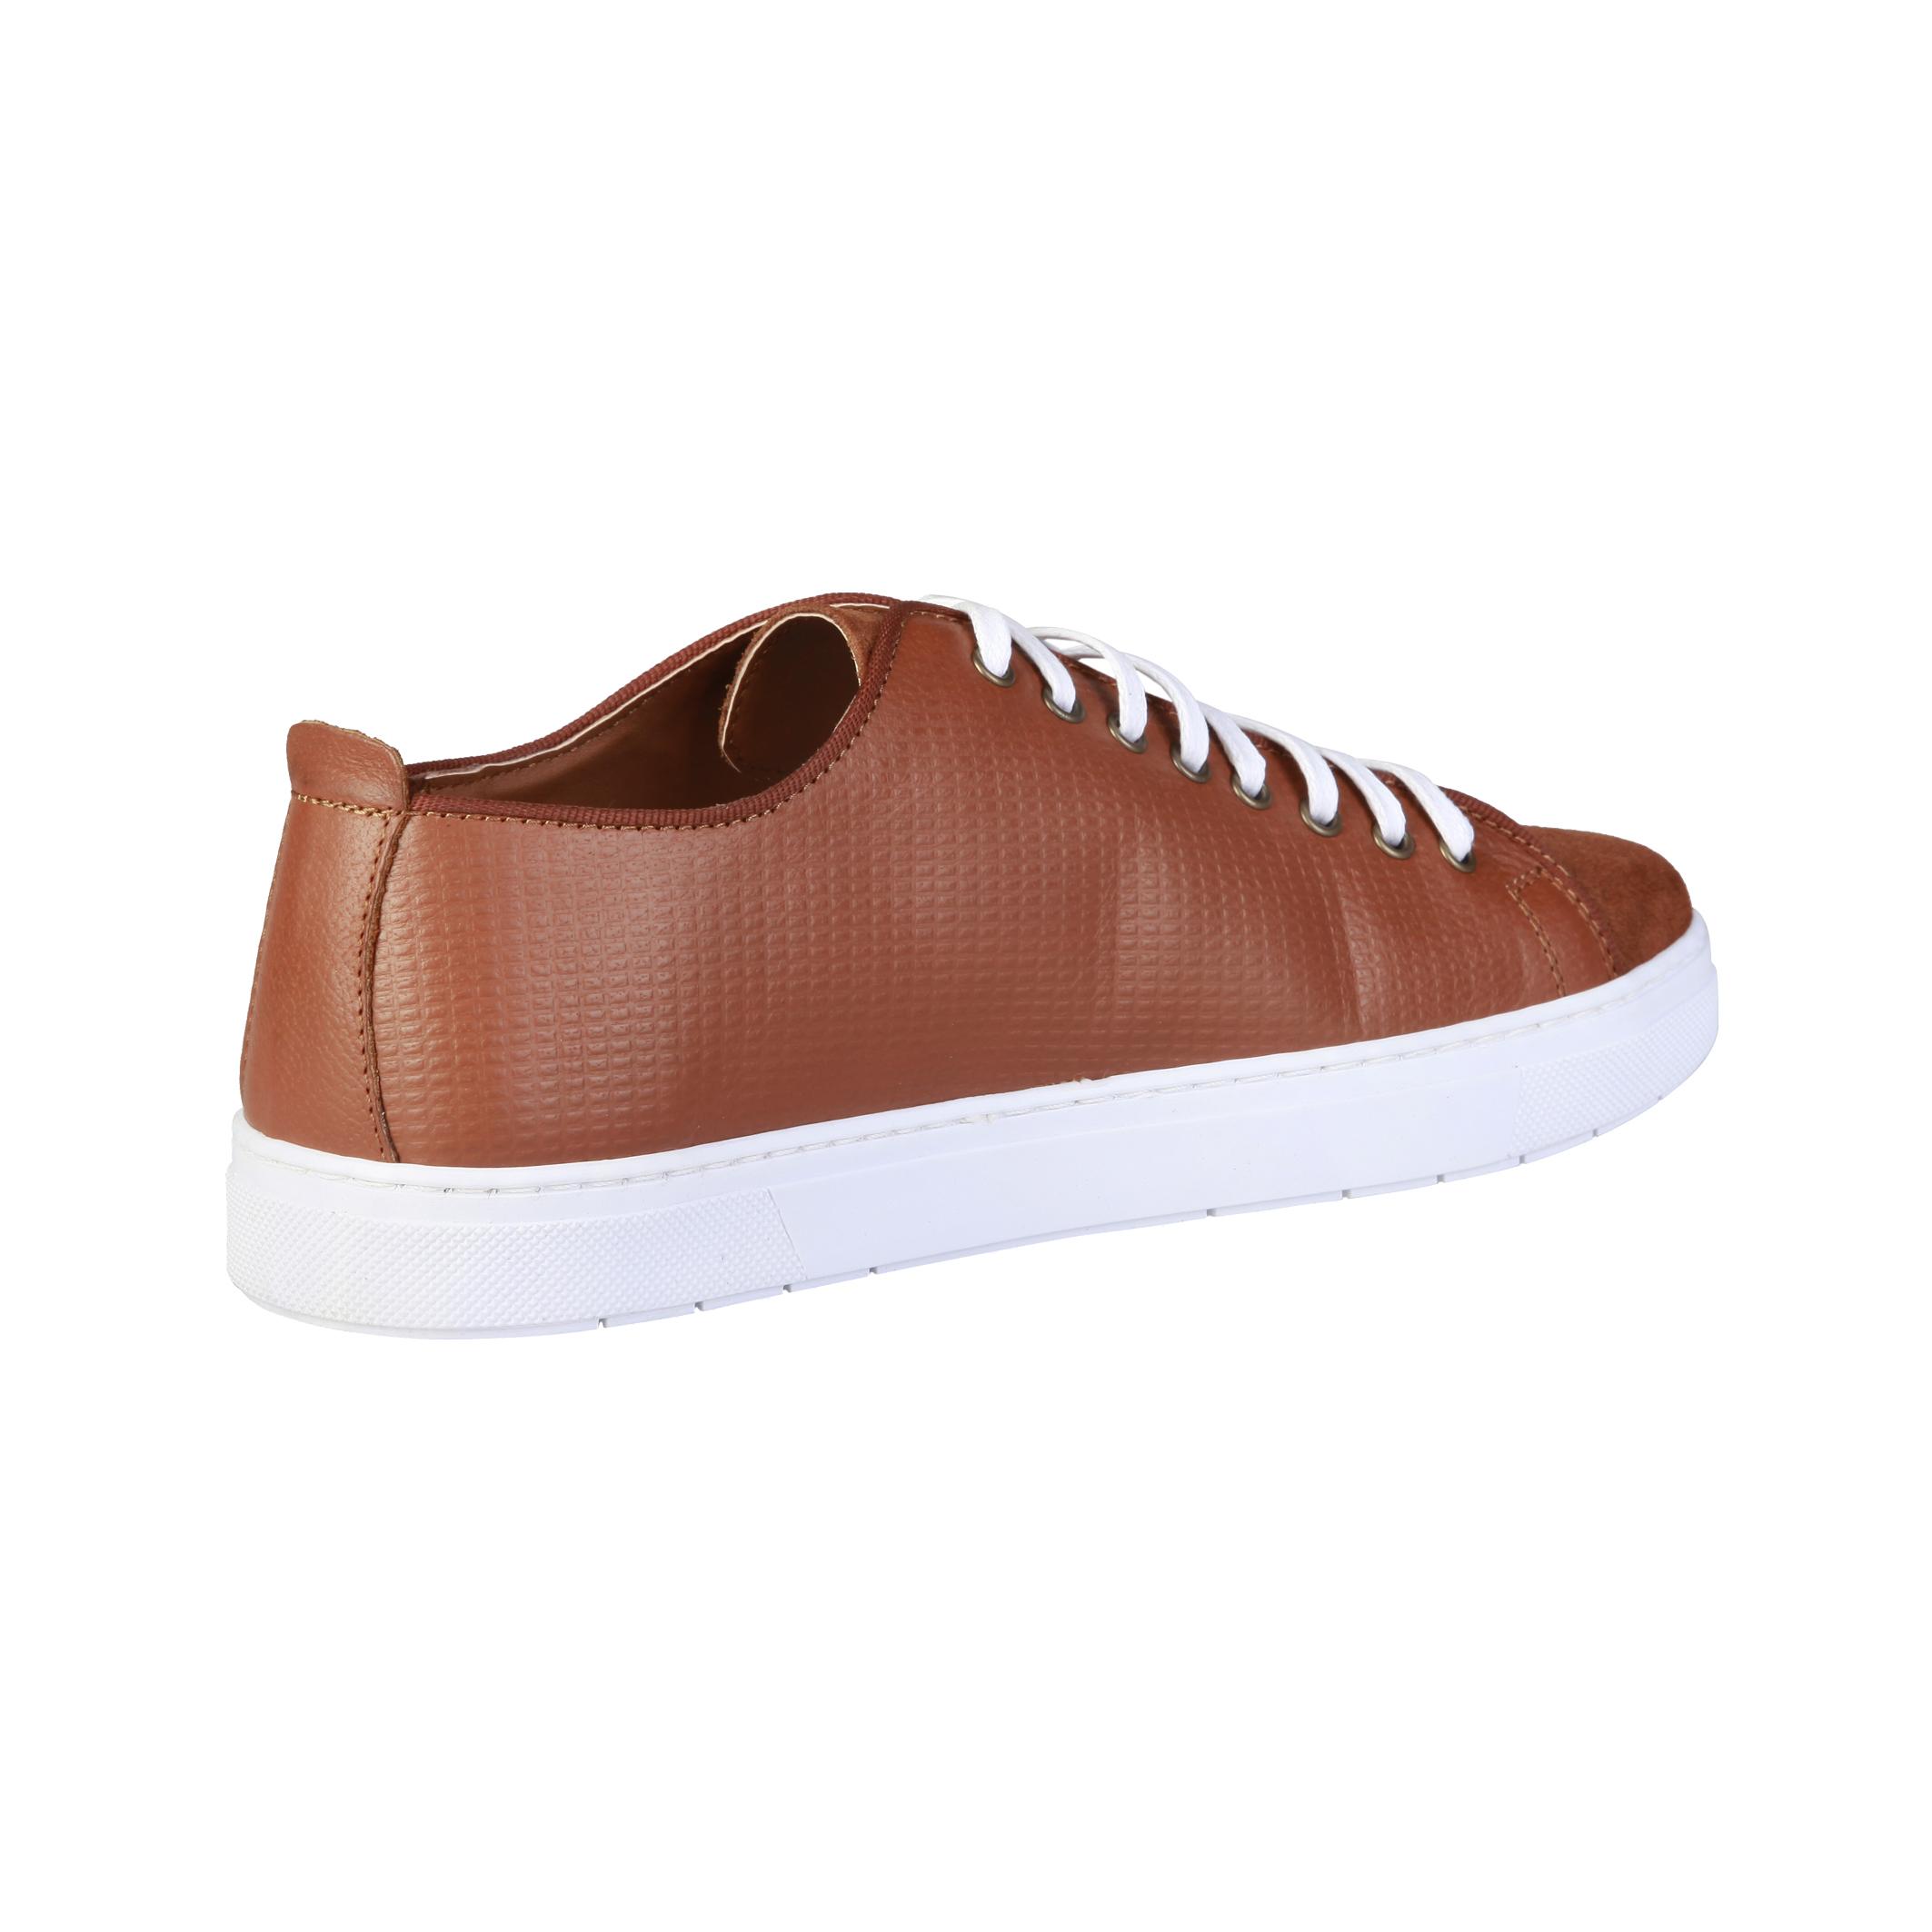 Sneakers-Pierre-Cardin-EDGARD-Uomo-Marrone-81933 miniatura 3